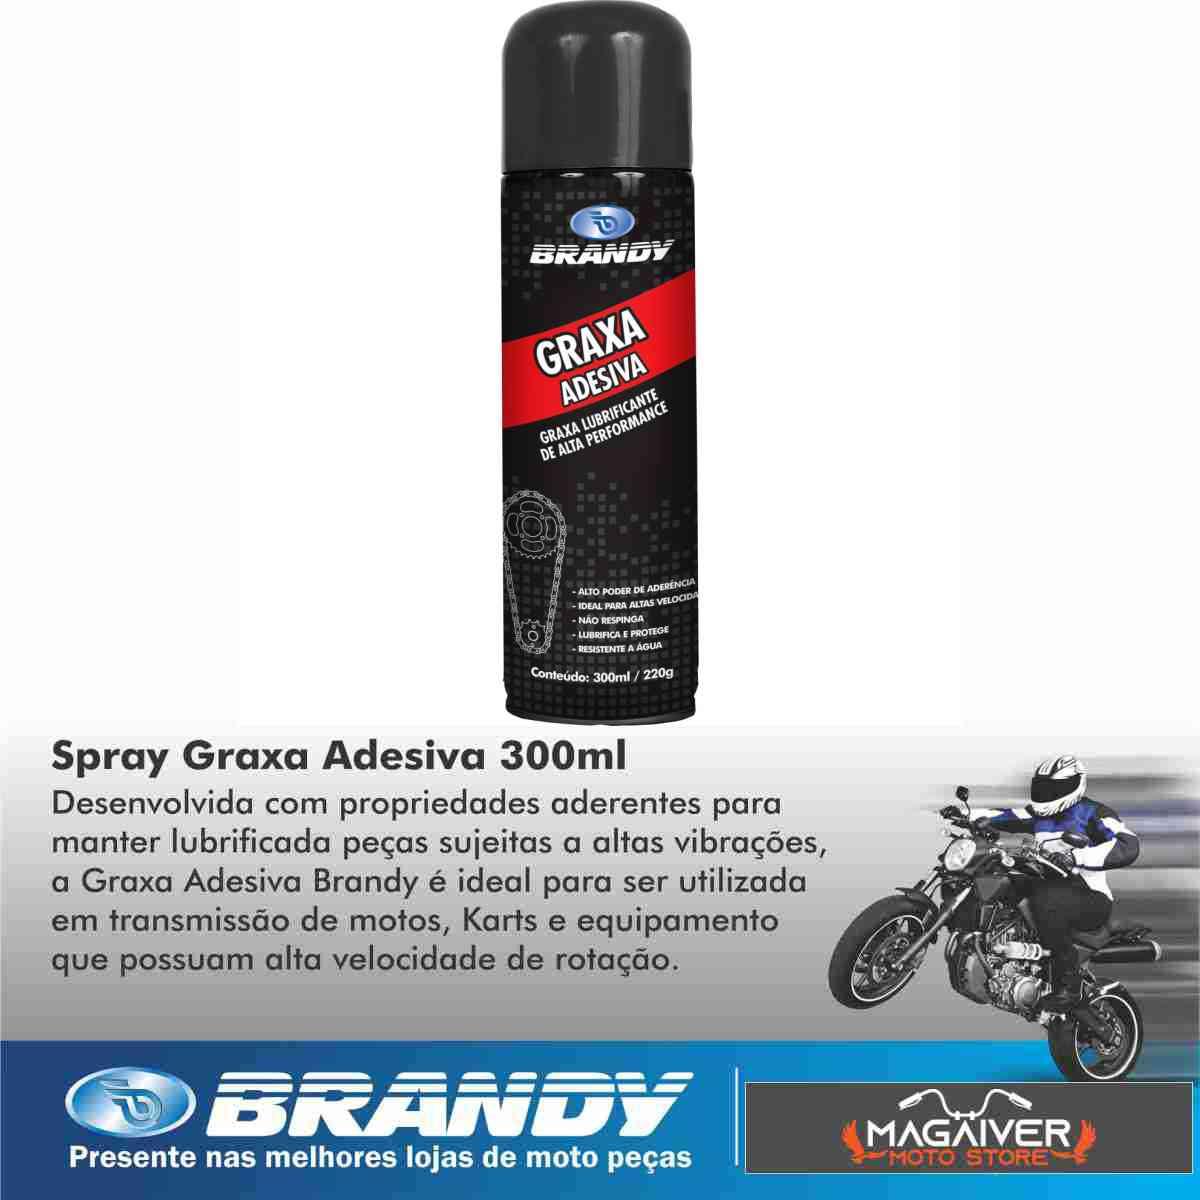 KIT 3 GRAXA ADESIVA MOTO SPRAY BRANDY ALTA PERFORMANCE + 1 REMOVEDOR LIMPA CORRENTE E MOTOR 300ml